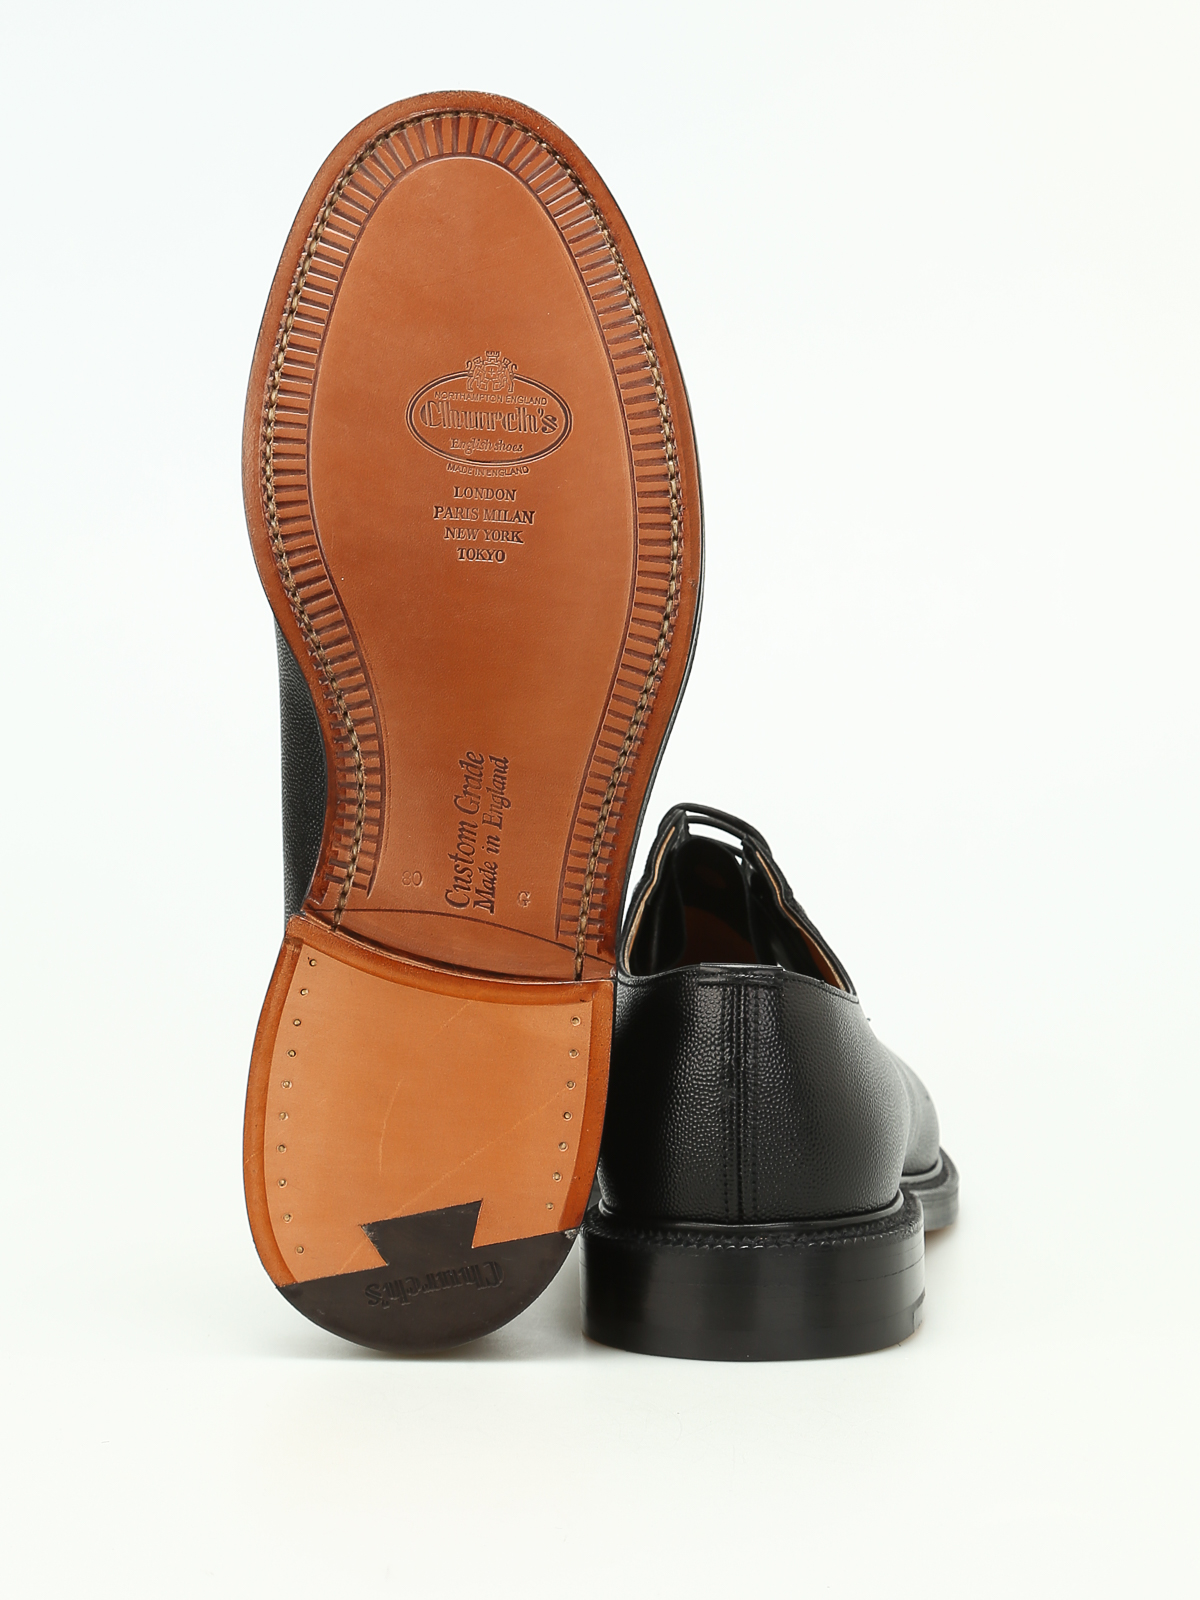 a760e0646f8a6 Church's - Shannon black Derby shoes - classic shoes ...